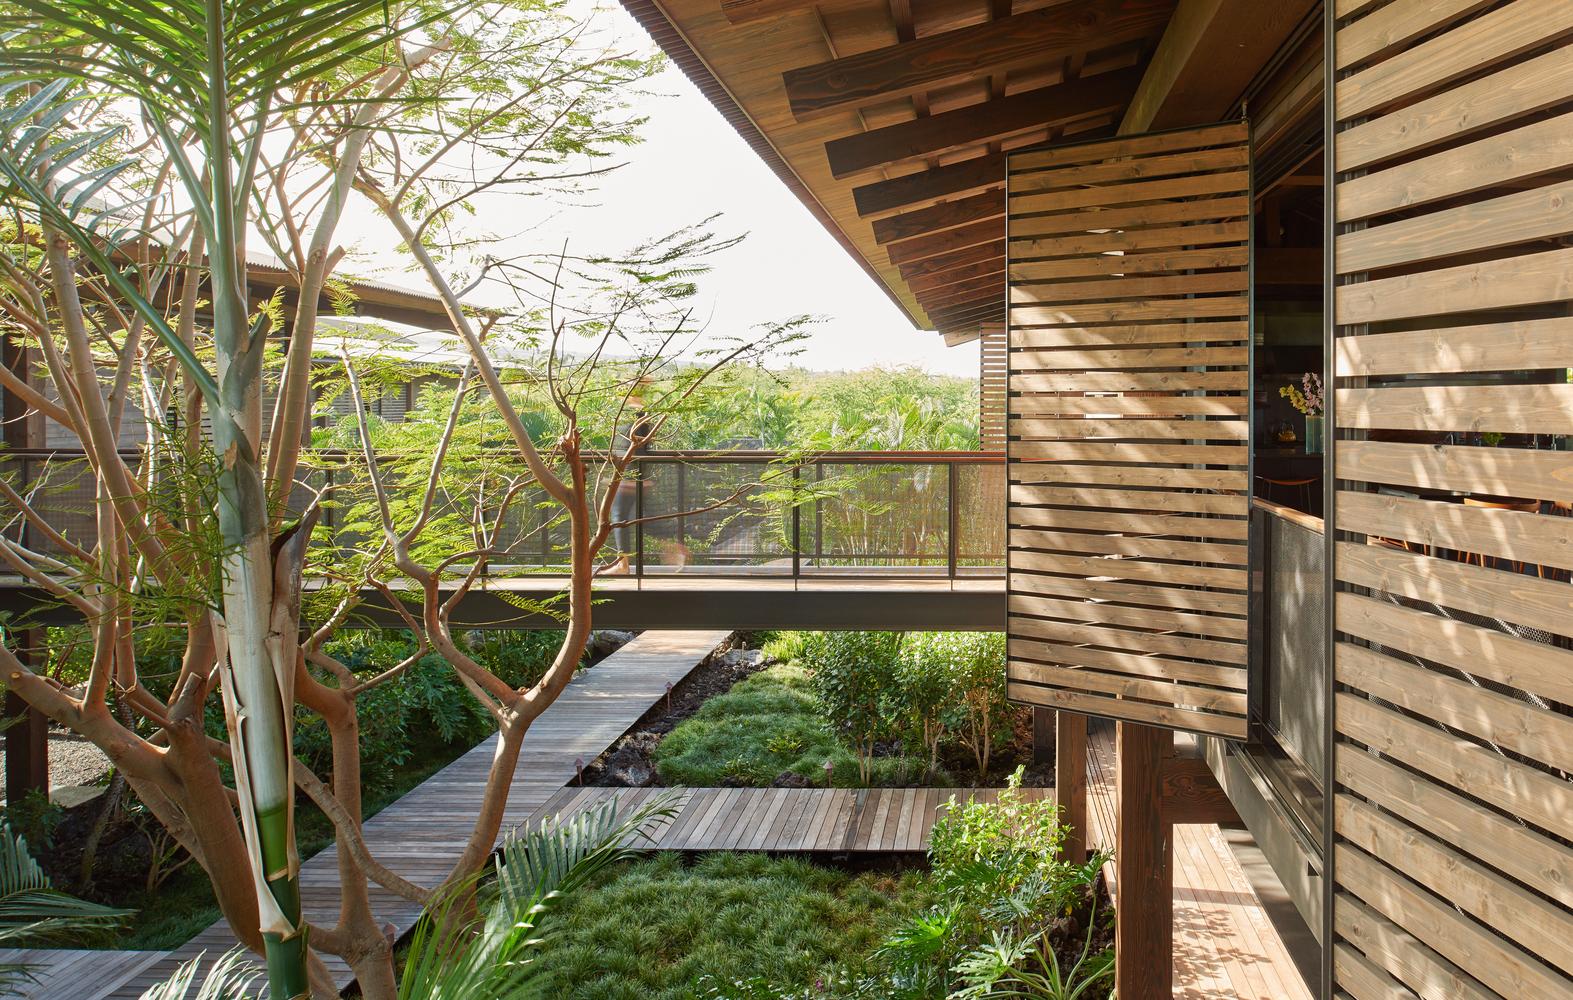 All'esterno si trova un ampio giardino con piscina e lounge bar  / Benjamin Benschneider